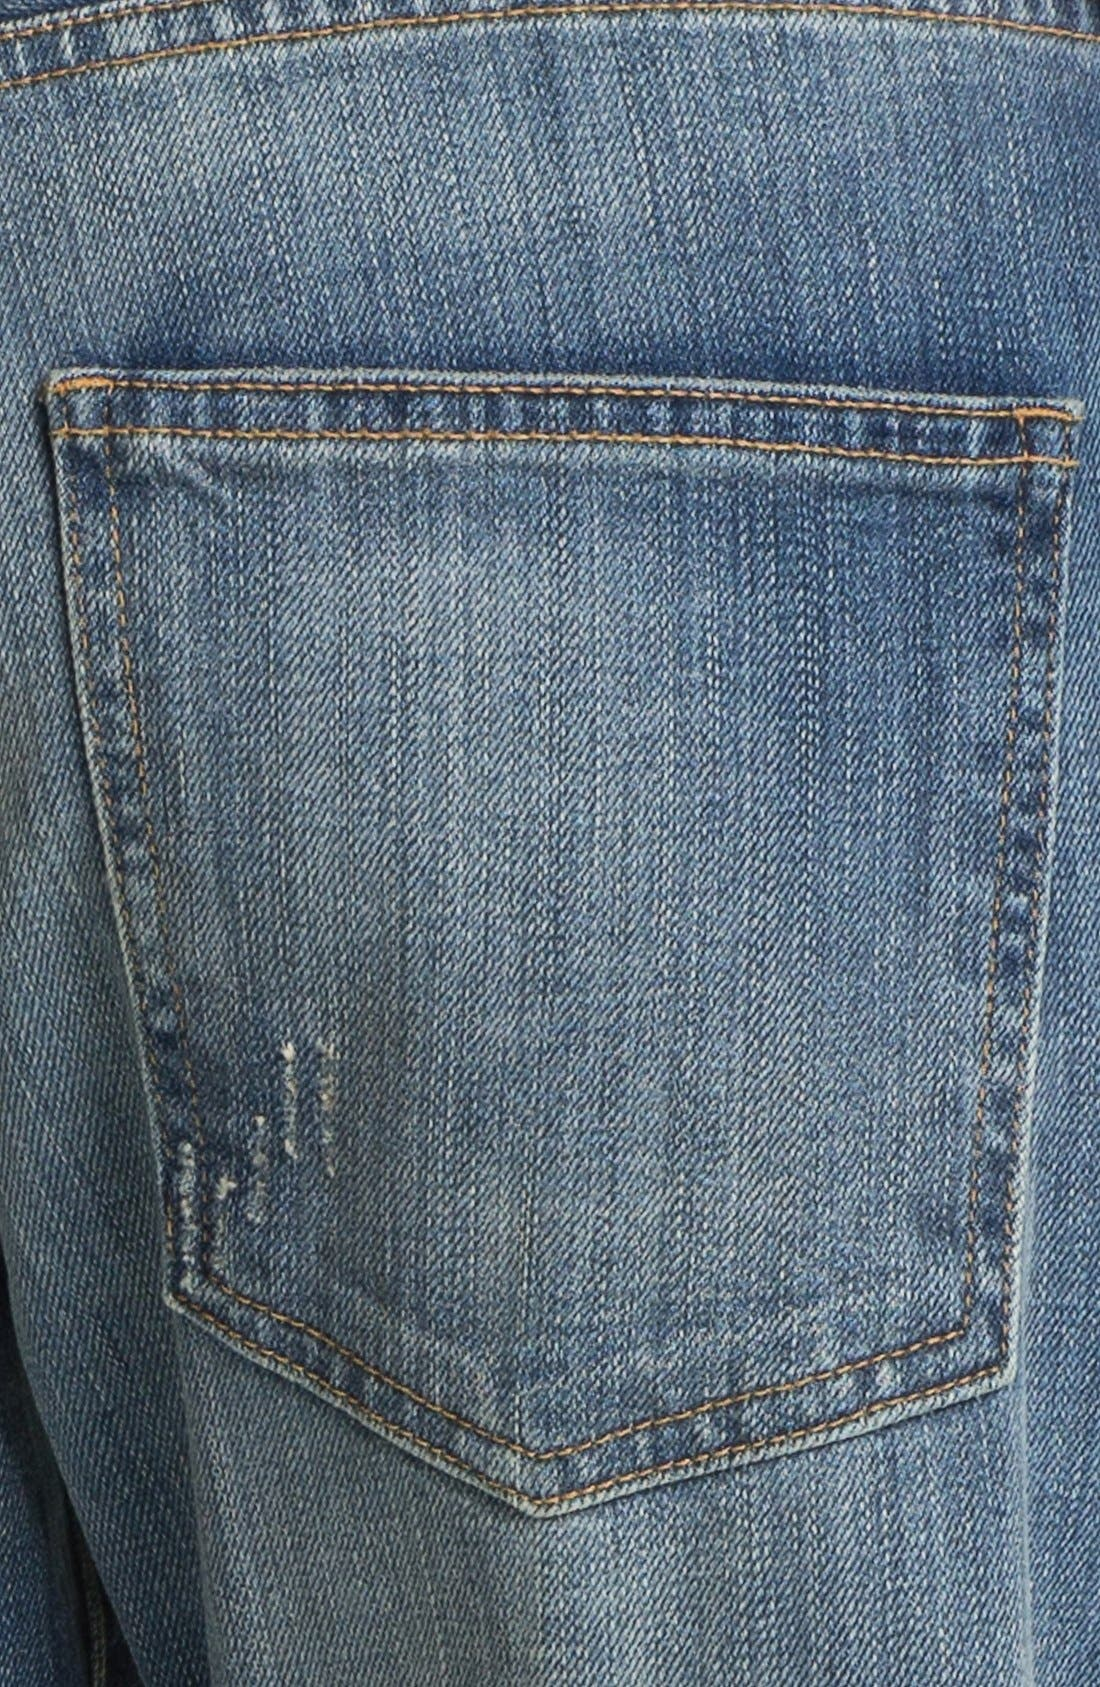 Alternate Image 3  - Current/Elliott 'The Boyfriend Jean' Jeans (Super Loved)